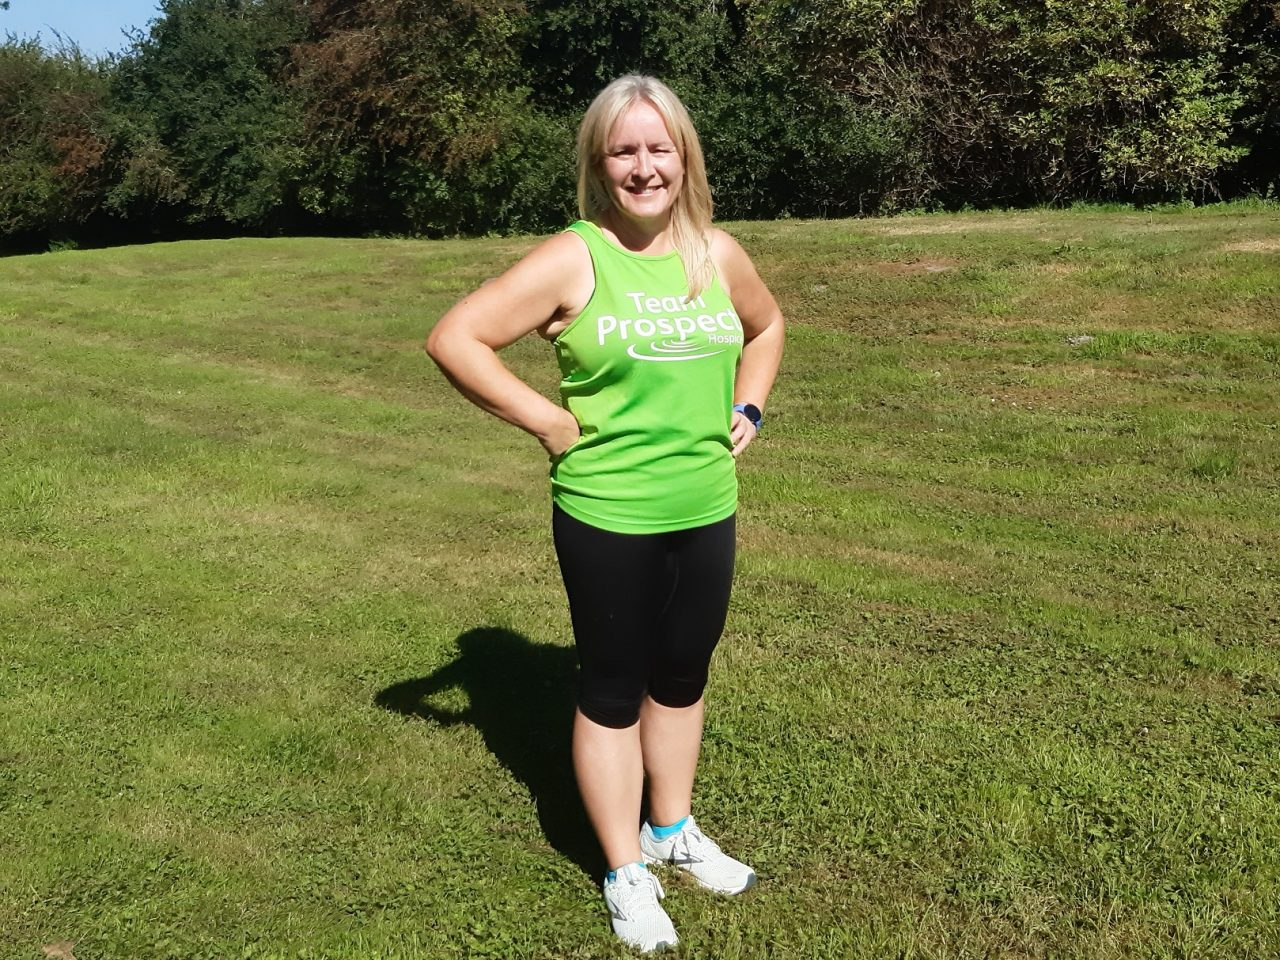 London Marathon challenge for 'slow' runners Sarah and Dorinda